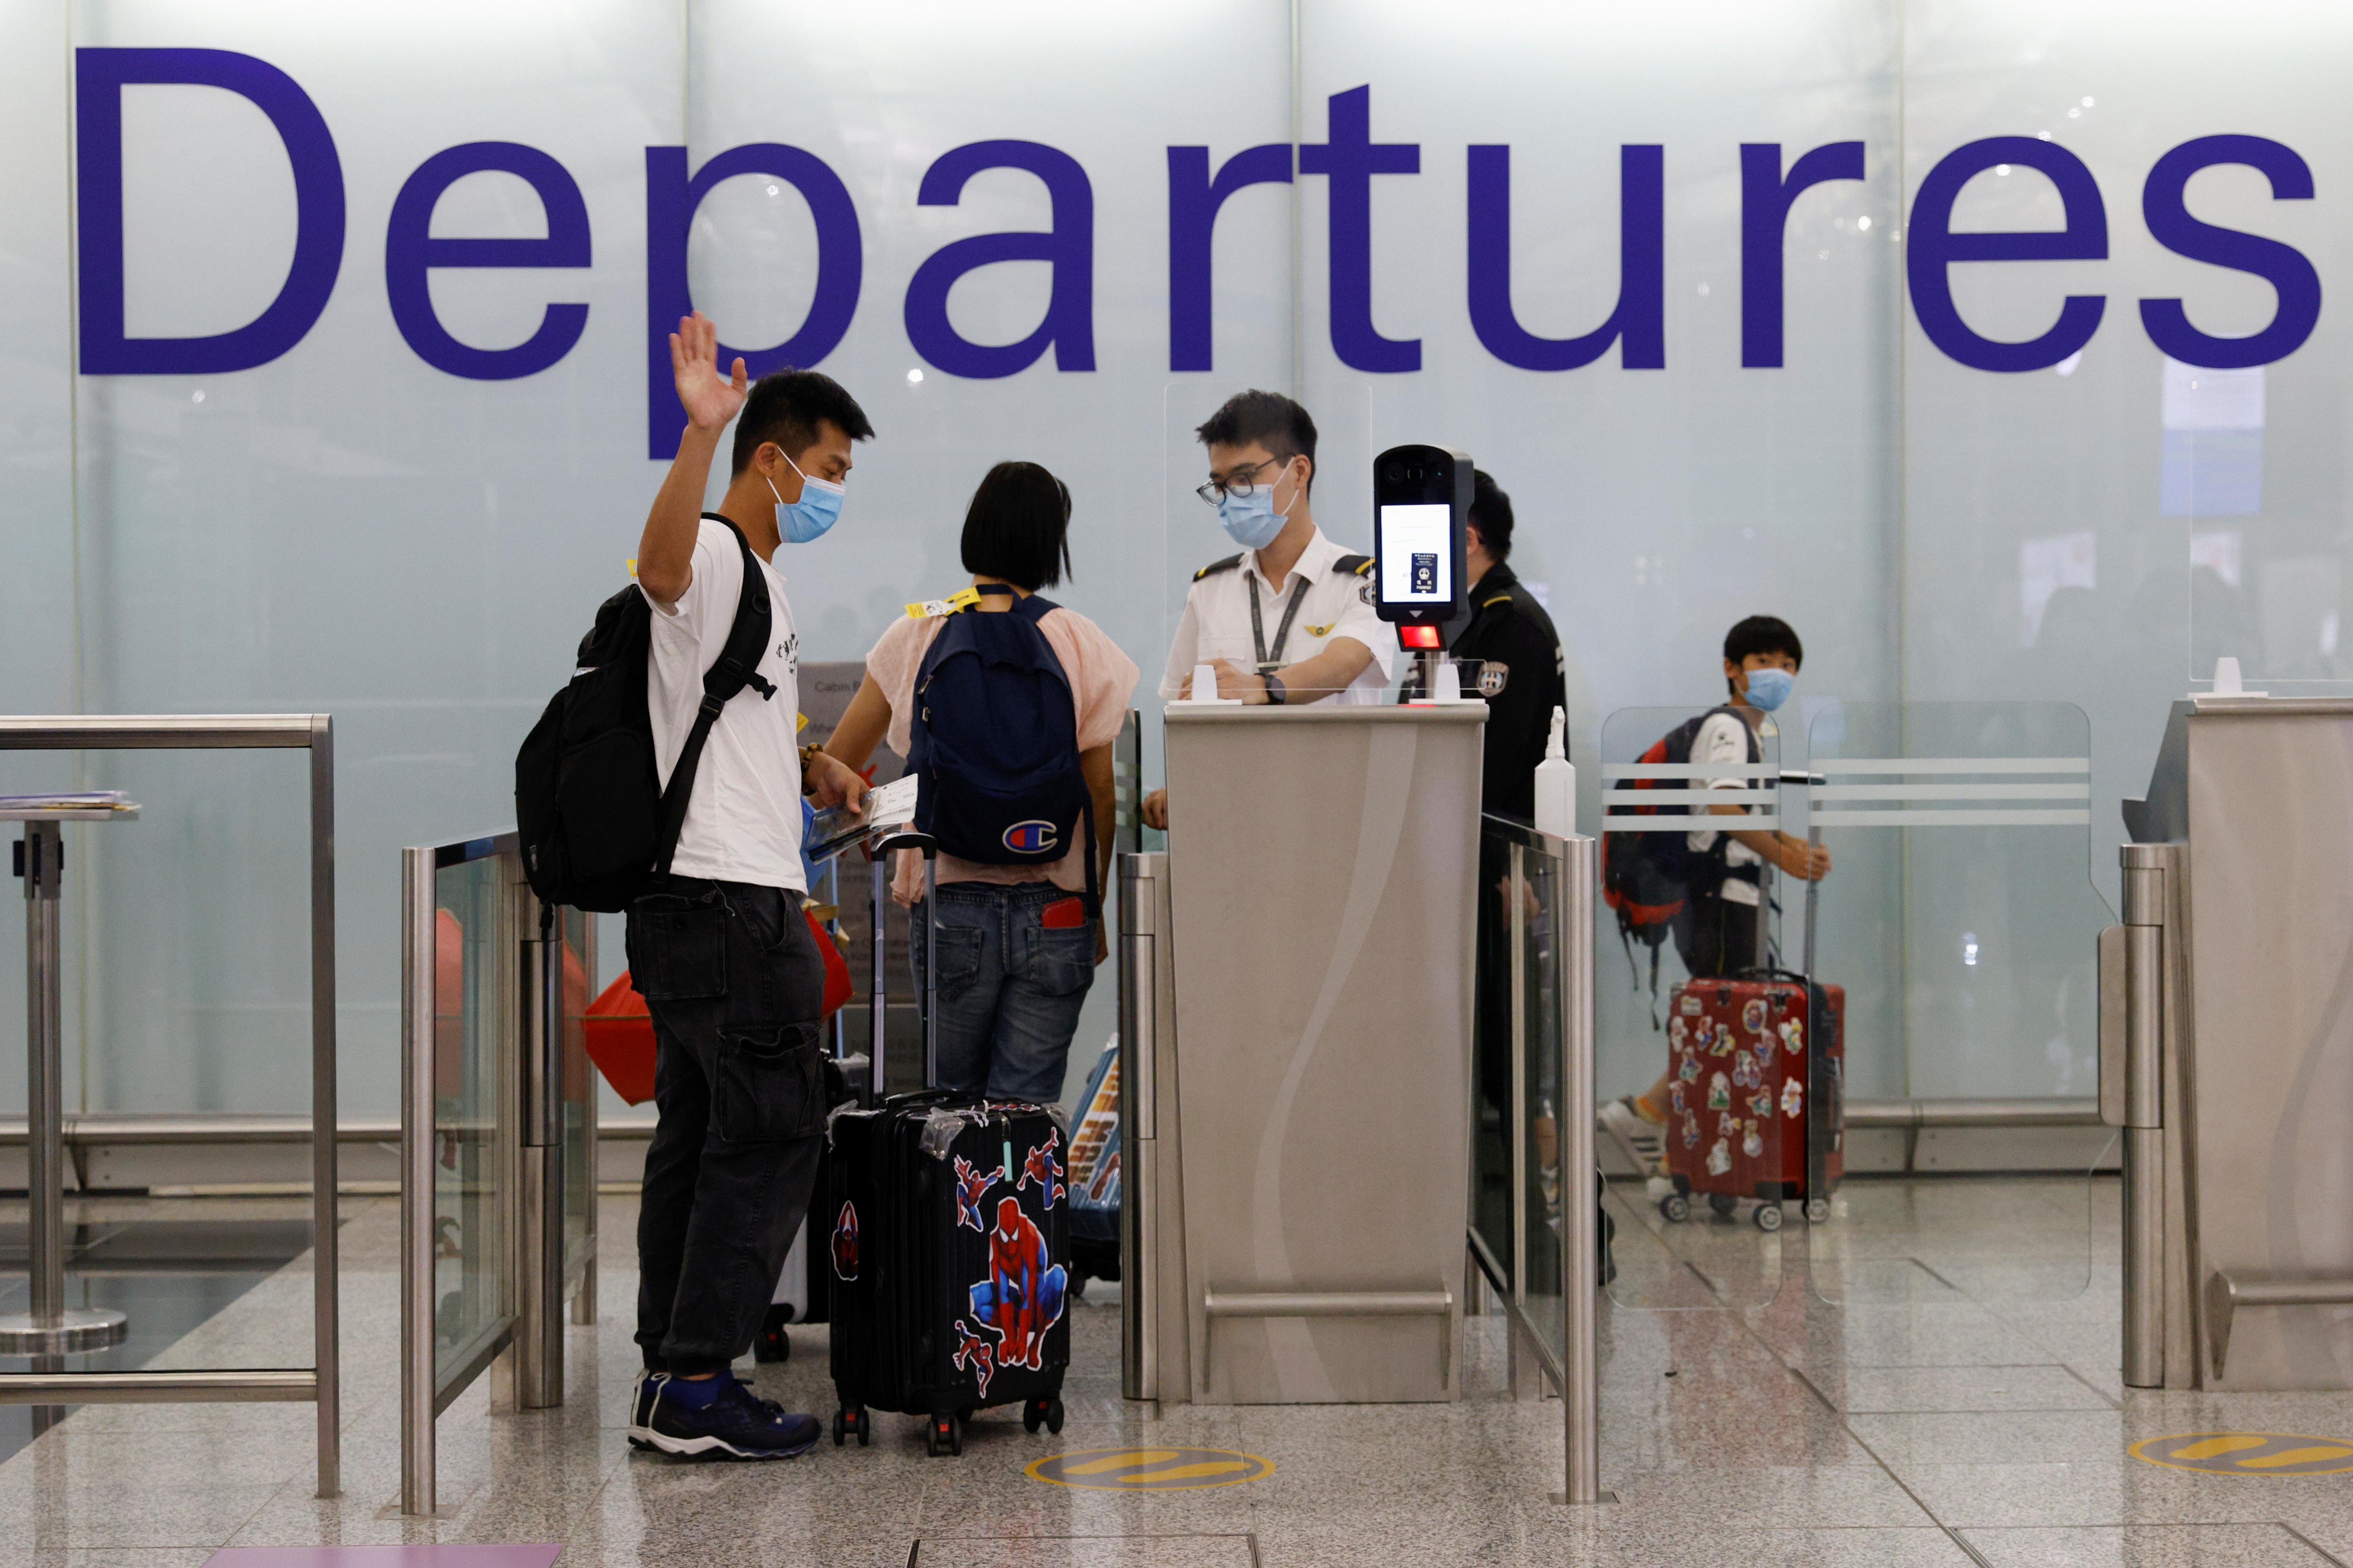 qz.com - Sumnima Kandangwa - Can Hong Kong retail recover without tourists?